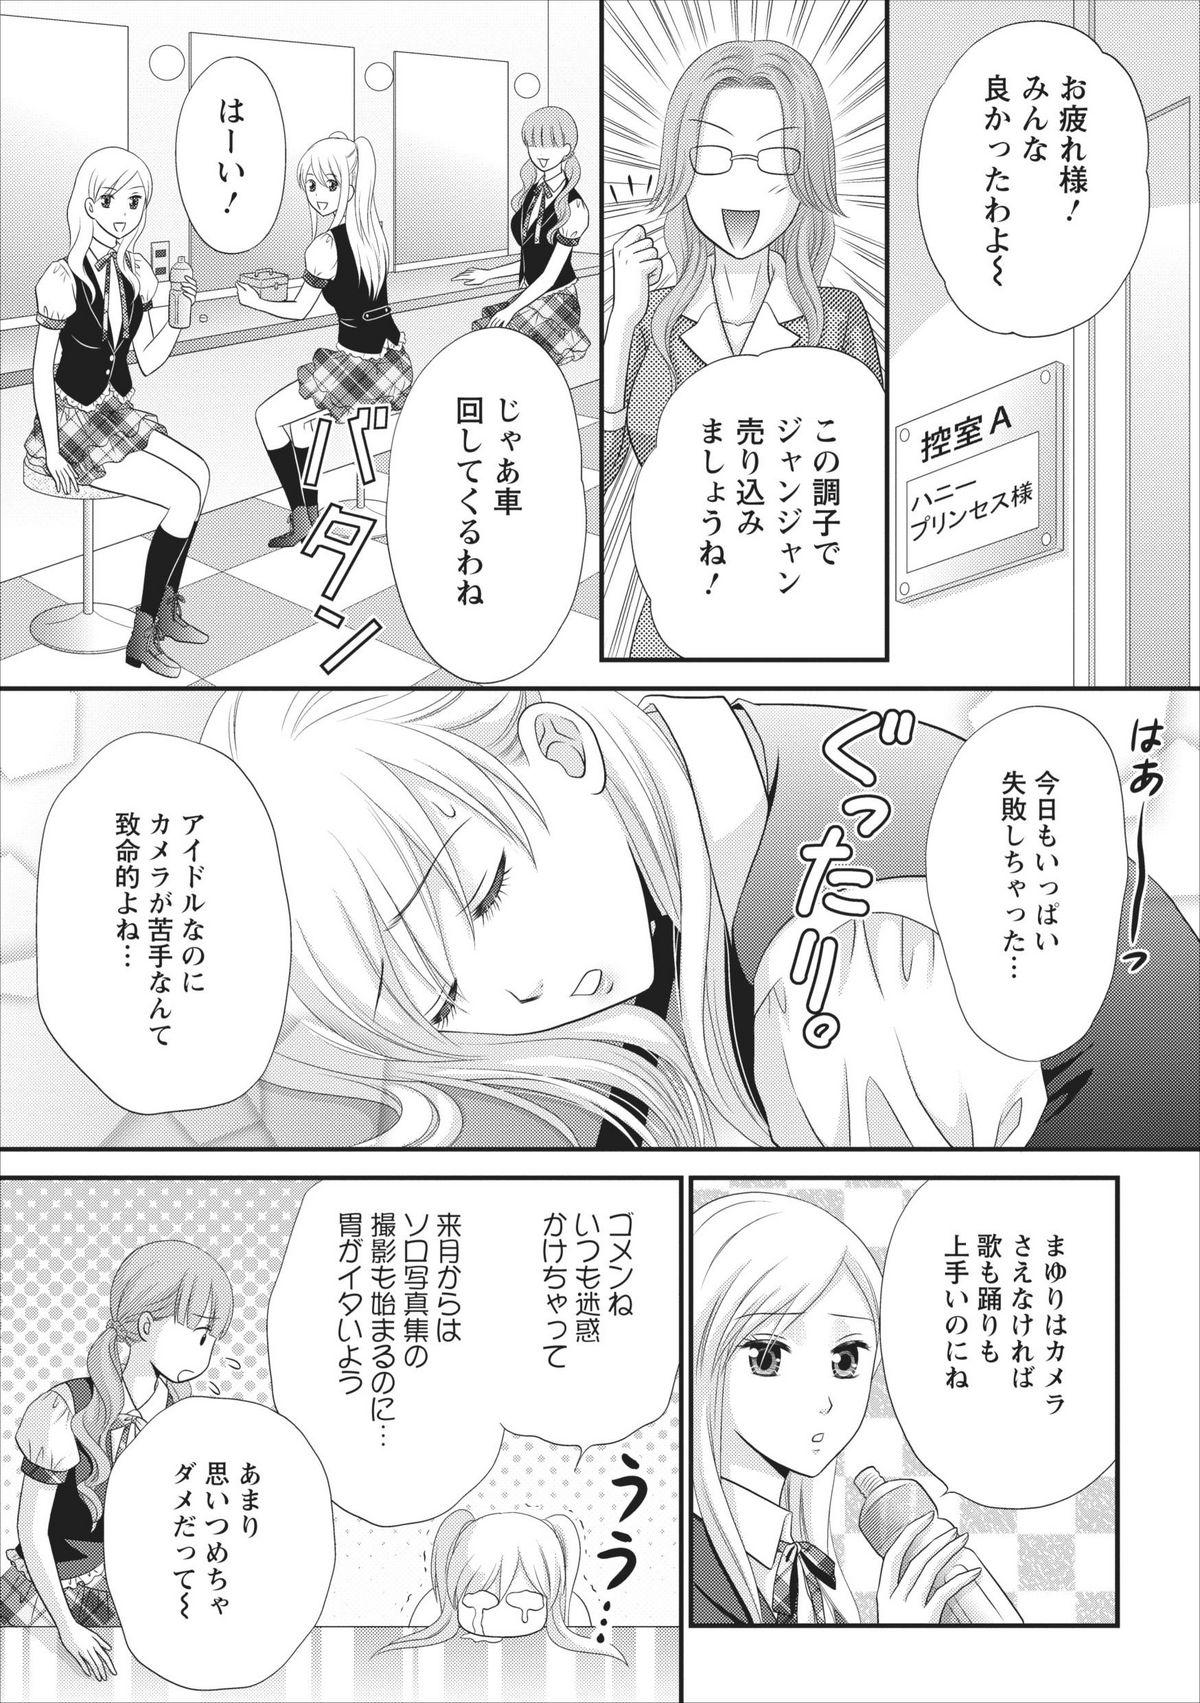 Himitsu Club Himiko - Inwai Kan no Joou ch.2 2